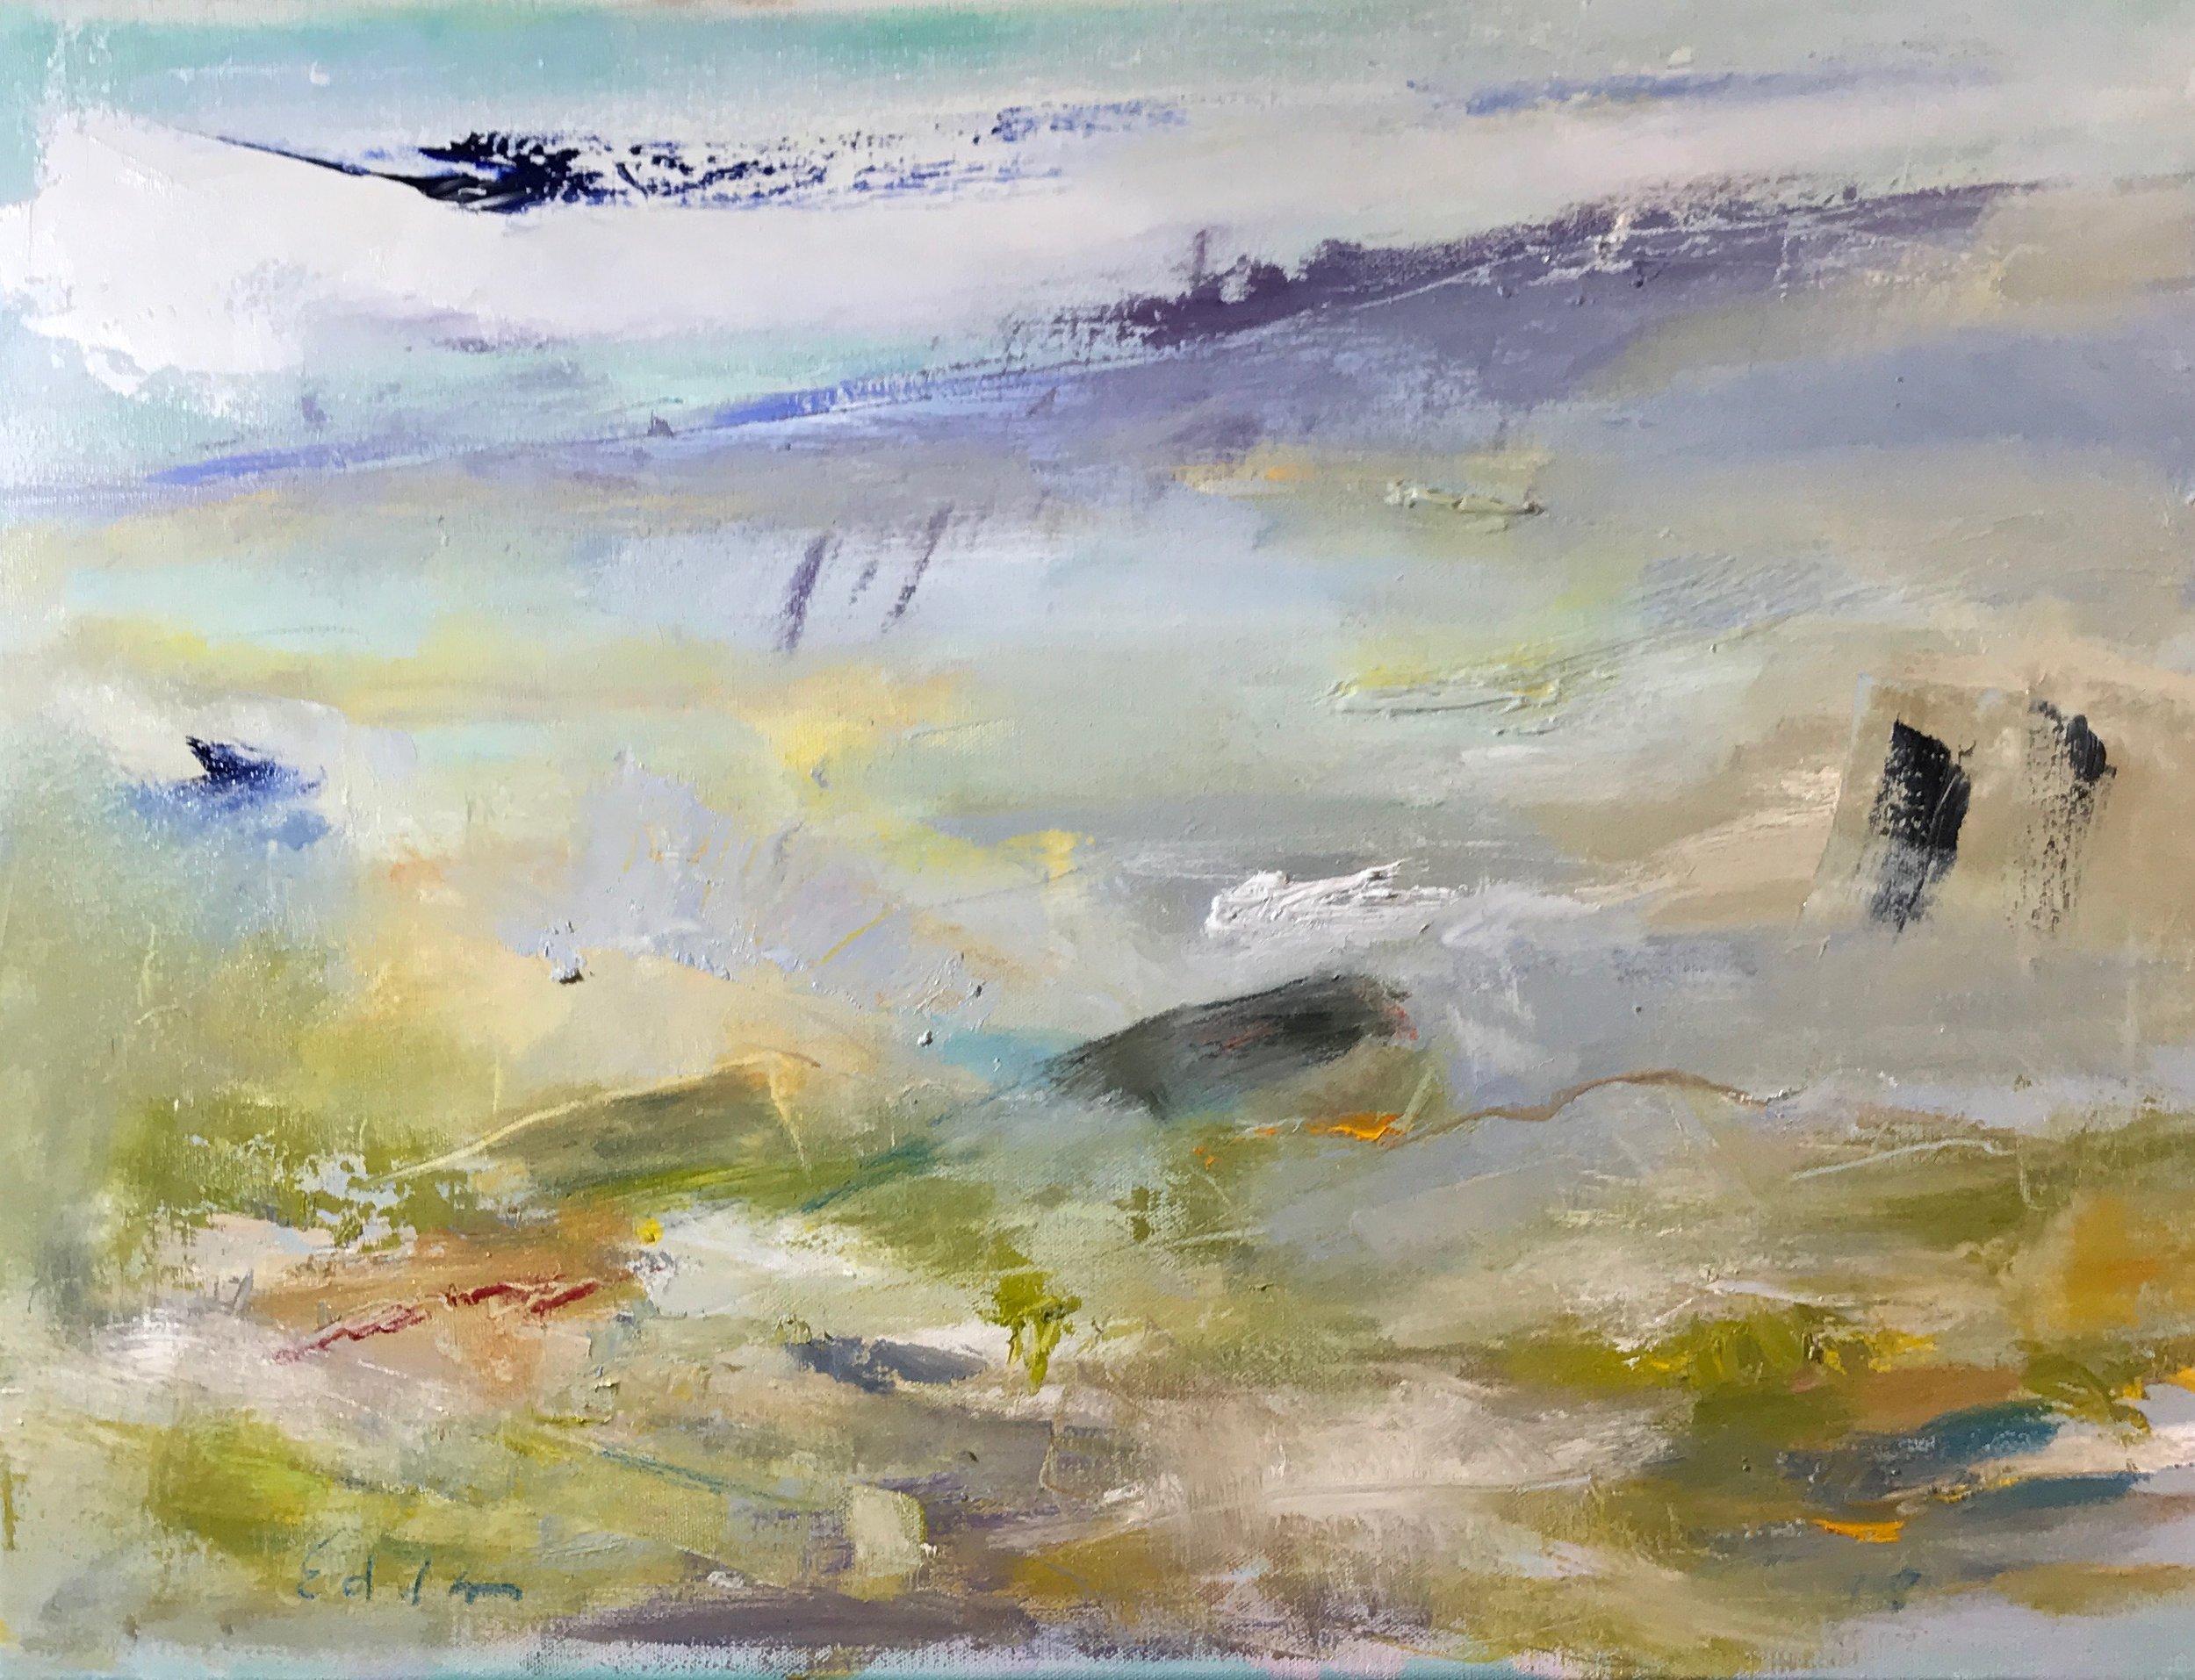 Paul Jay Edelson-Breaking Wave-Oil on Canvas-$875